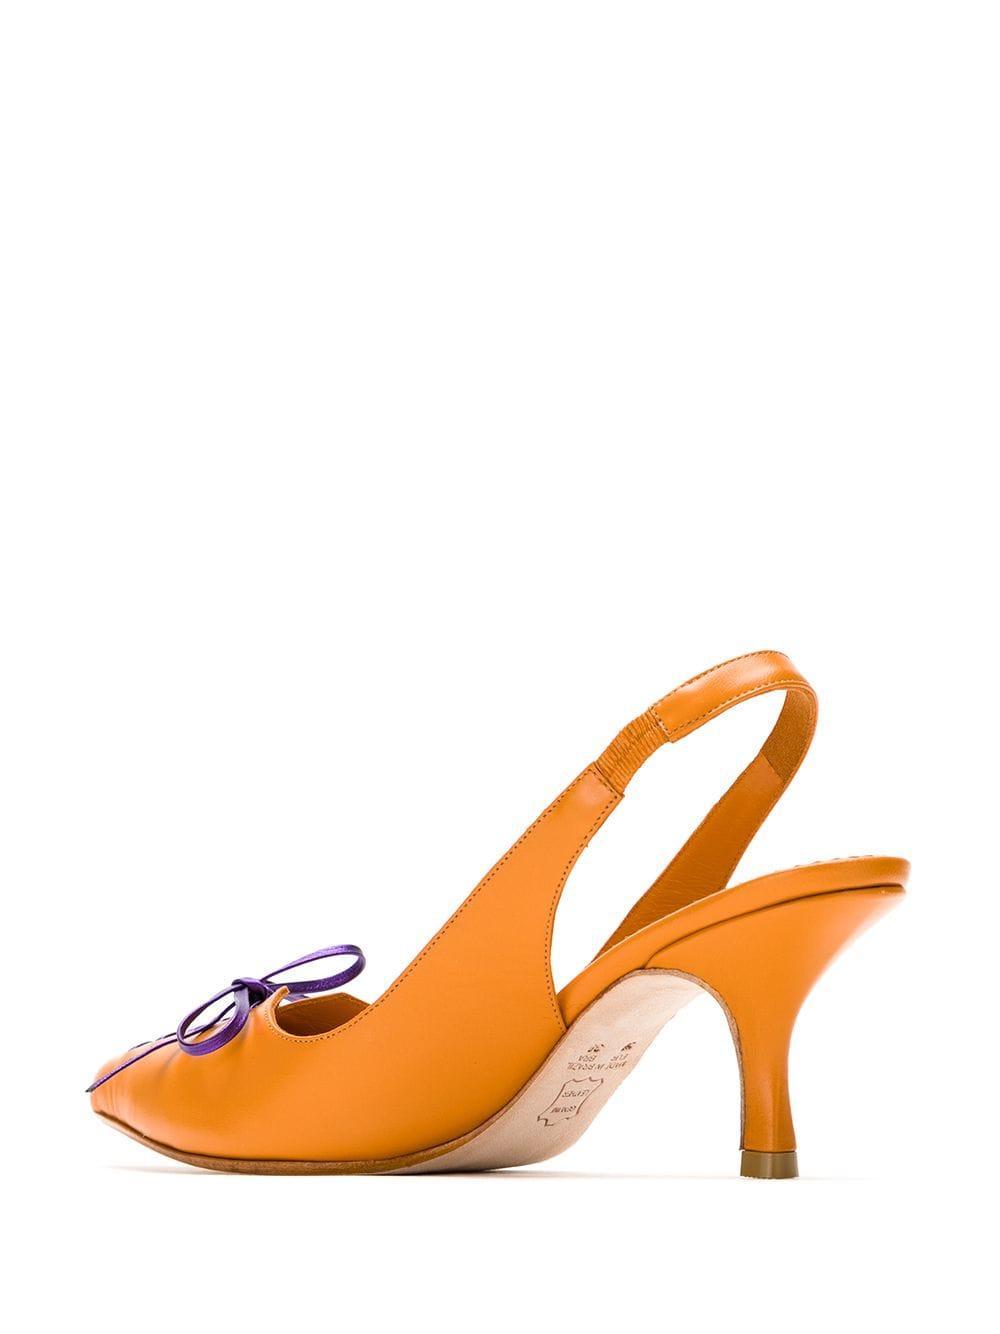 Zapatos de tacón con tira trasera y lazo Sarah Chofakian de color Naranja